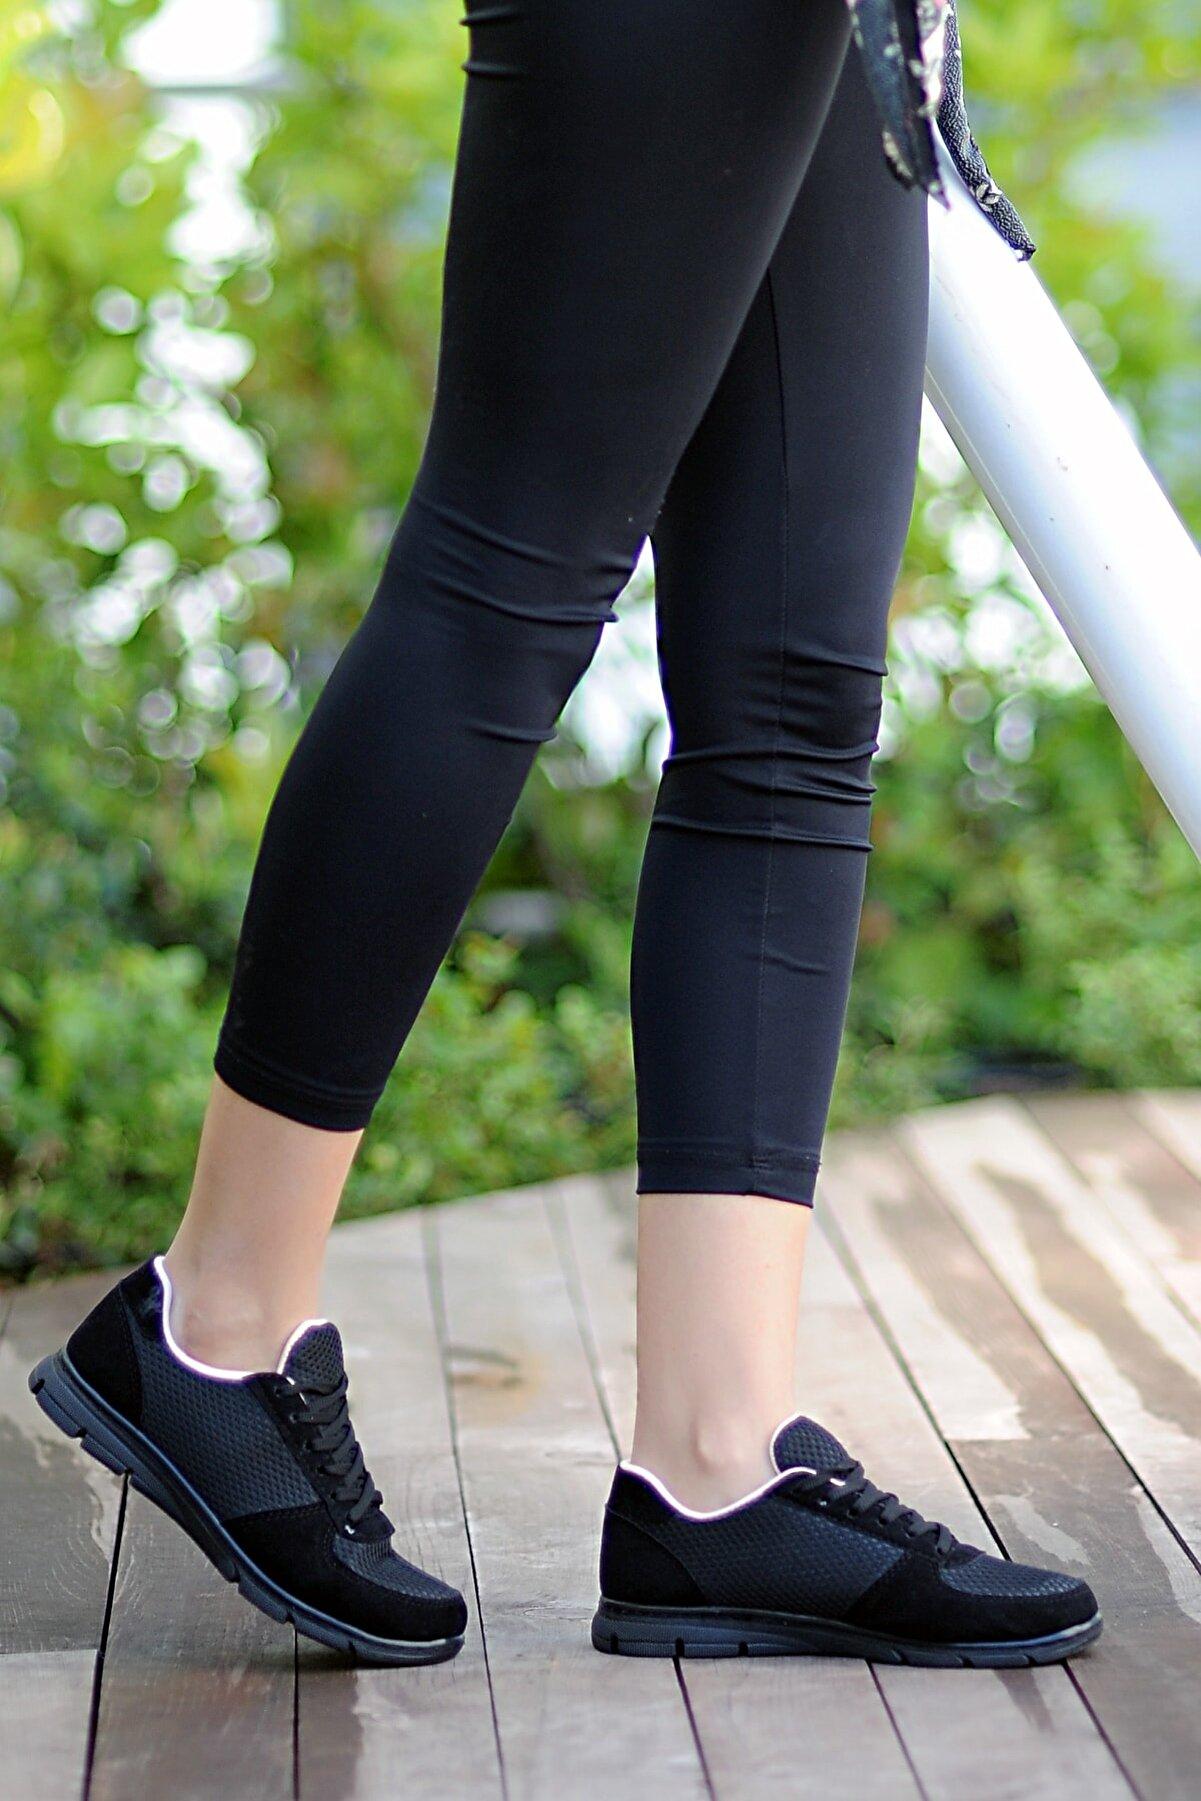 Pembe Potin Kadın Siyah Siyah Ayakkabı